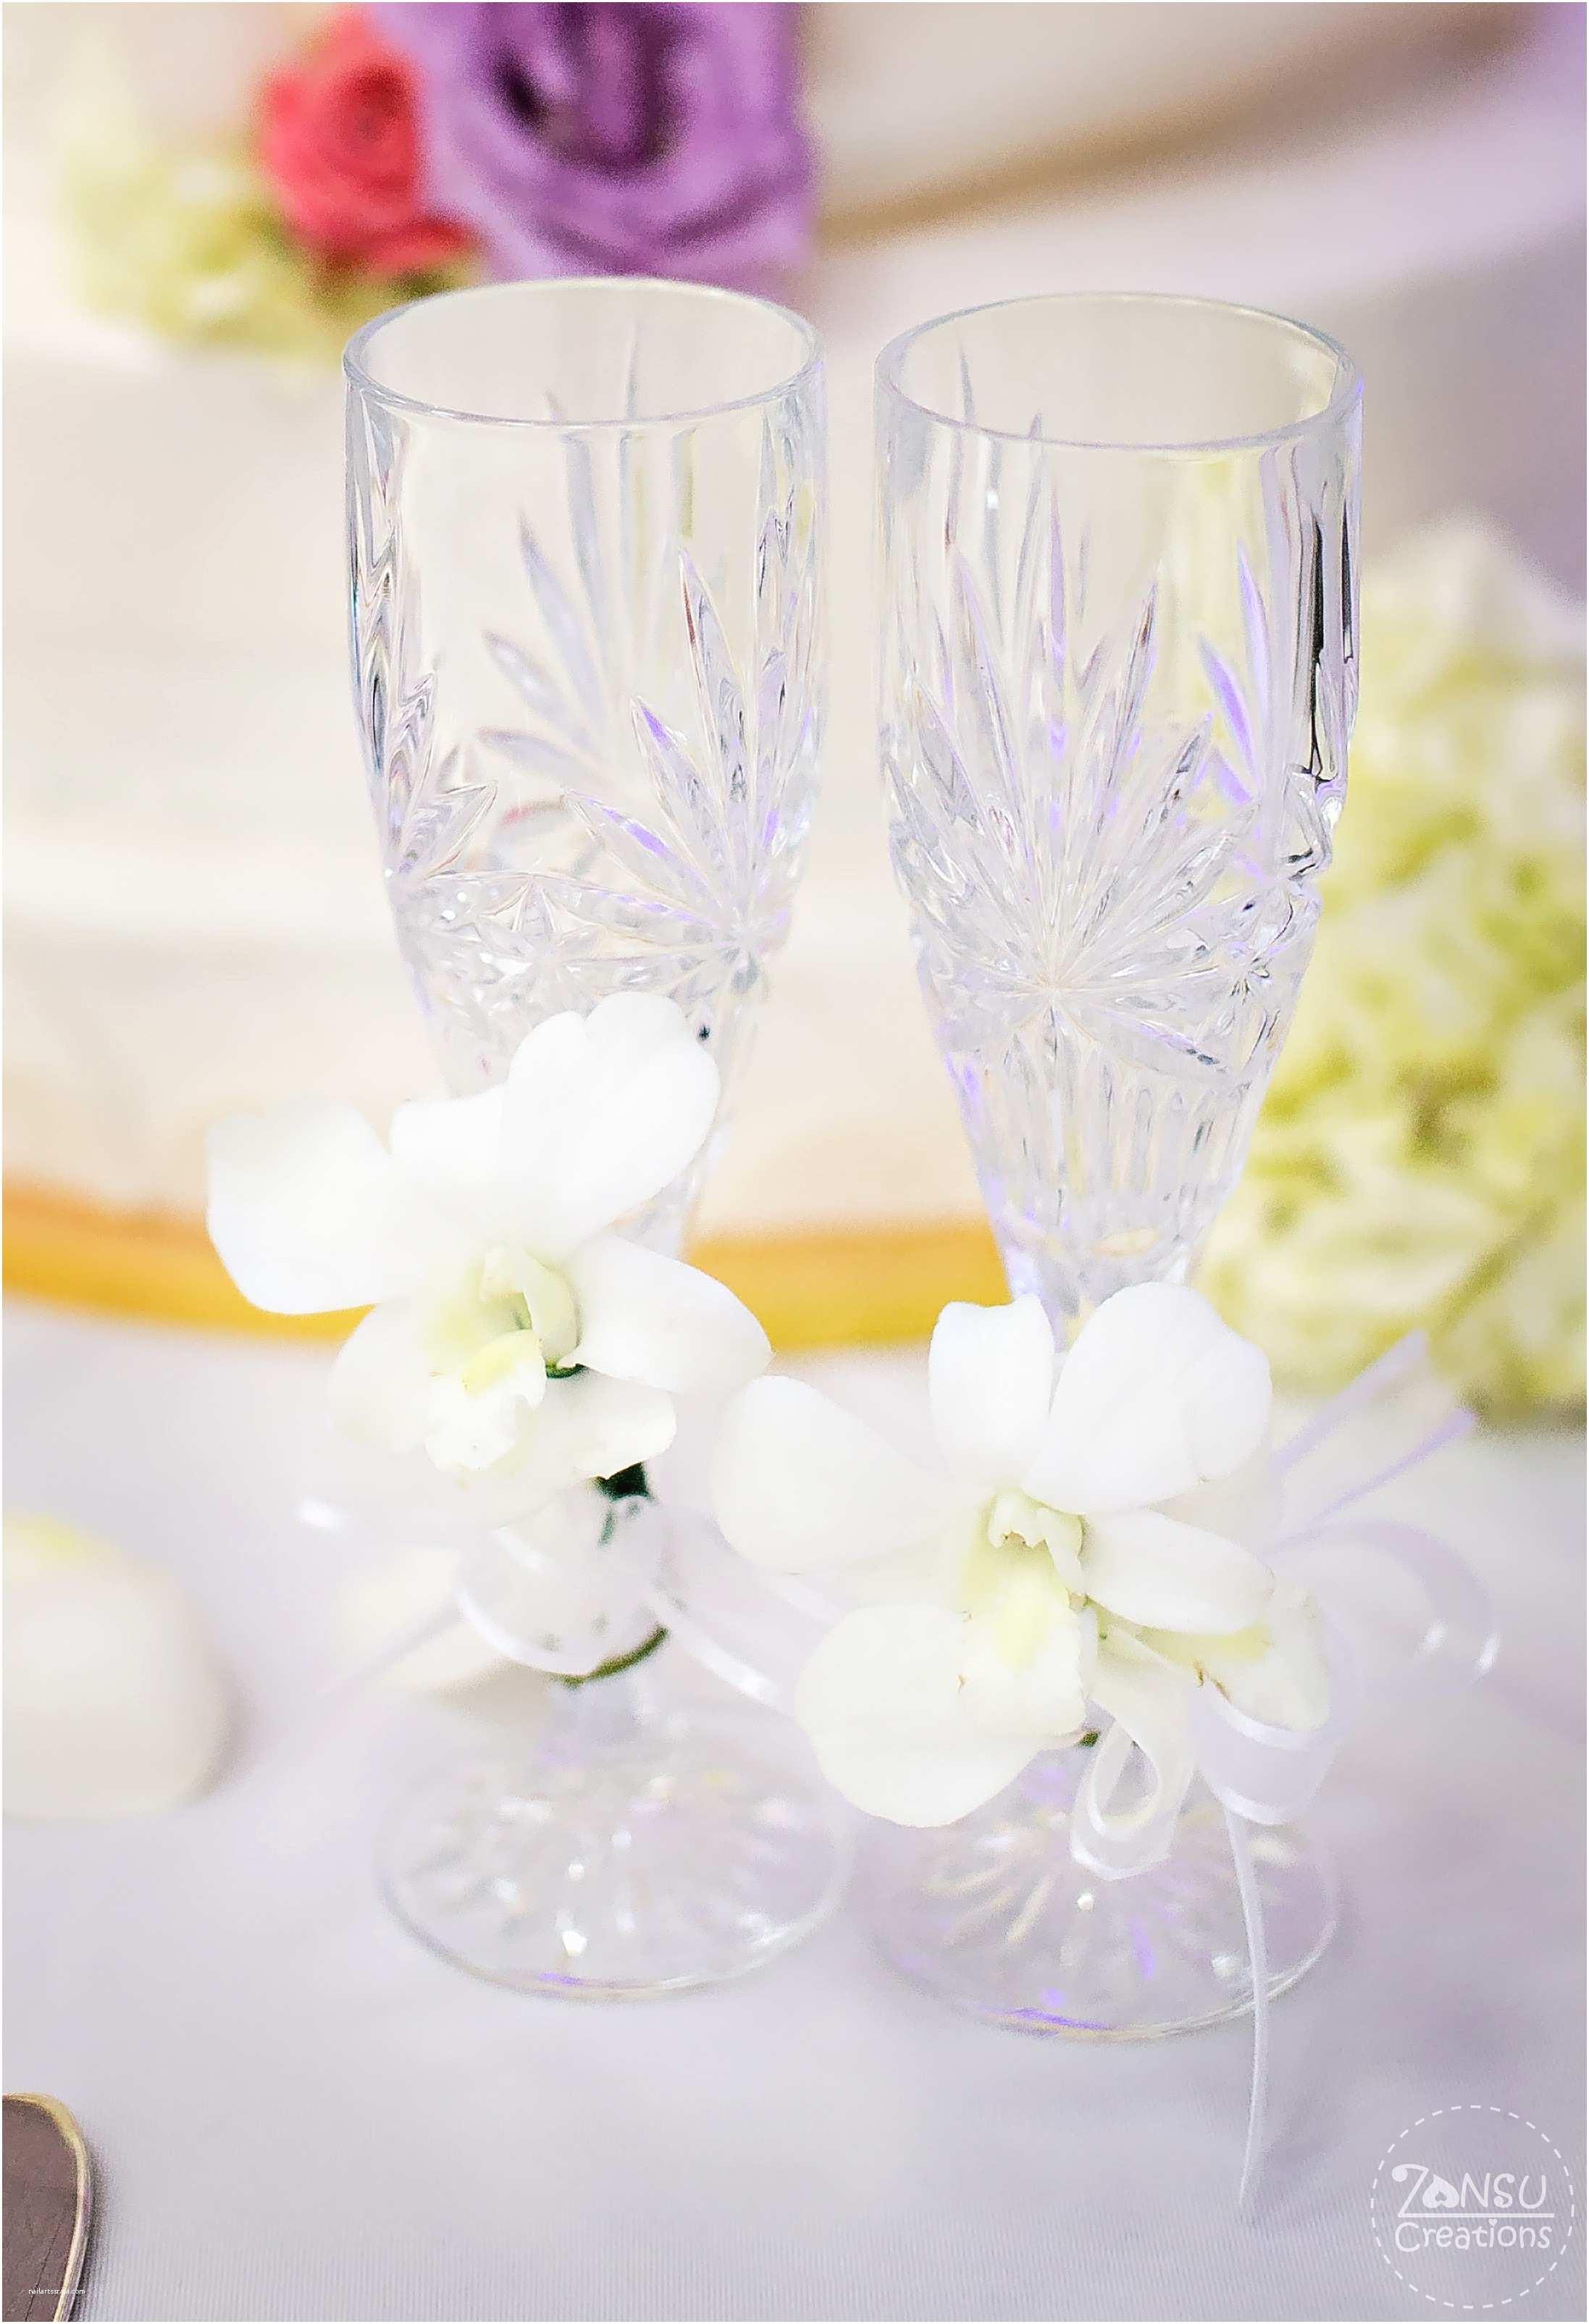 Wedding Invitations Under 50 Cents Each Wedding Favors Under 50 Cents